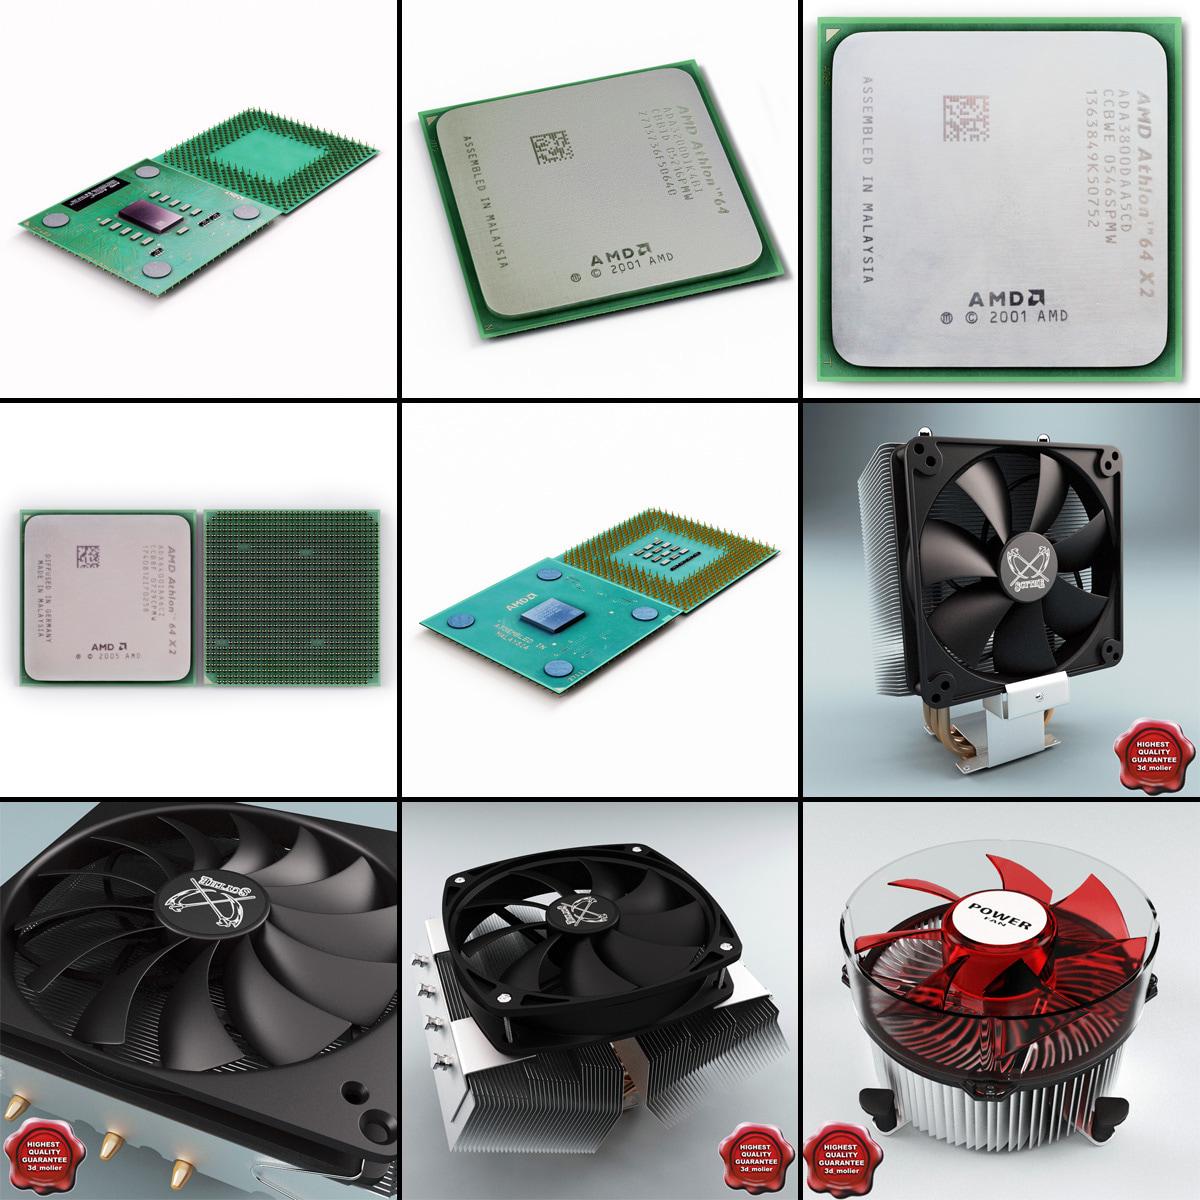 c4d amd processors v2